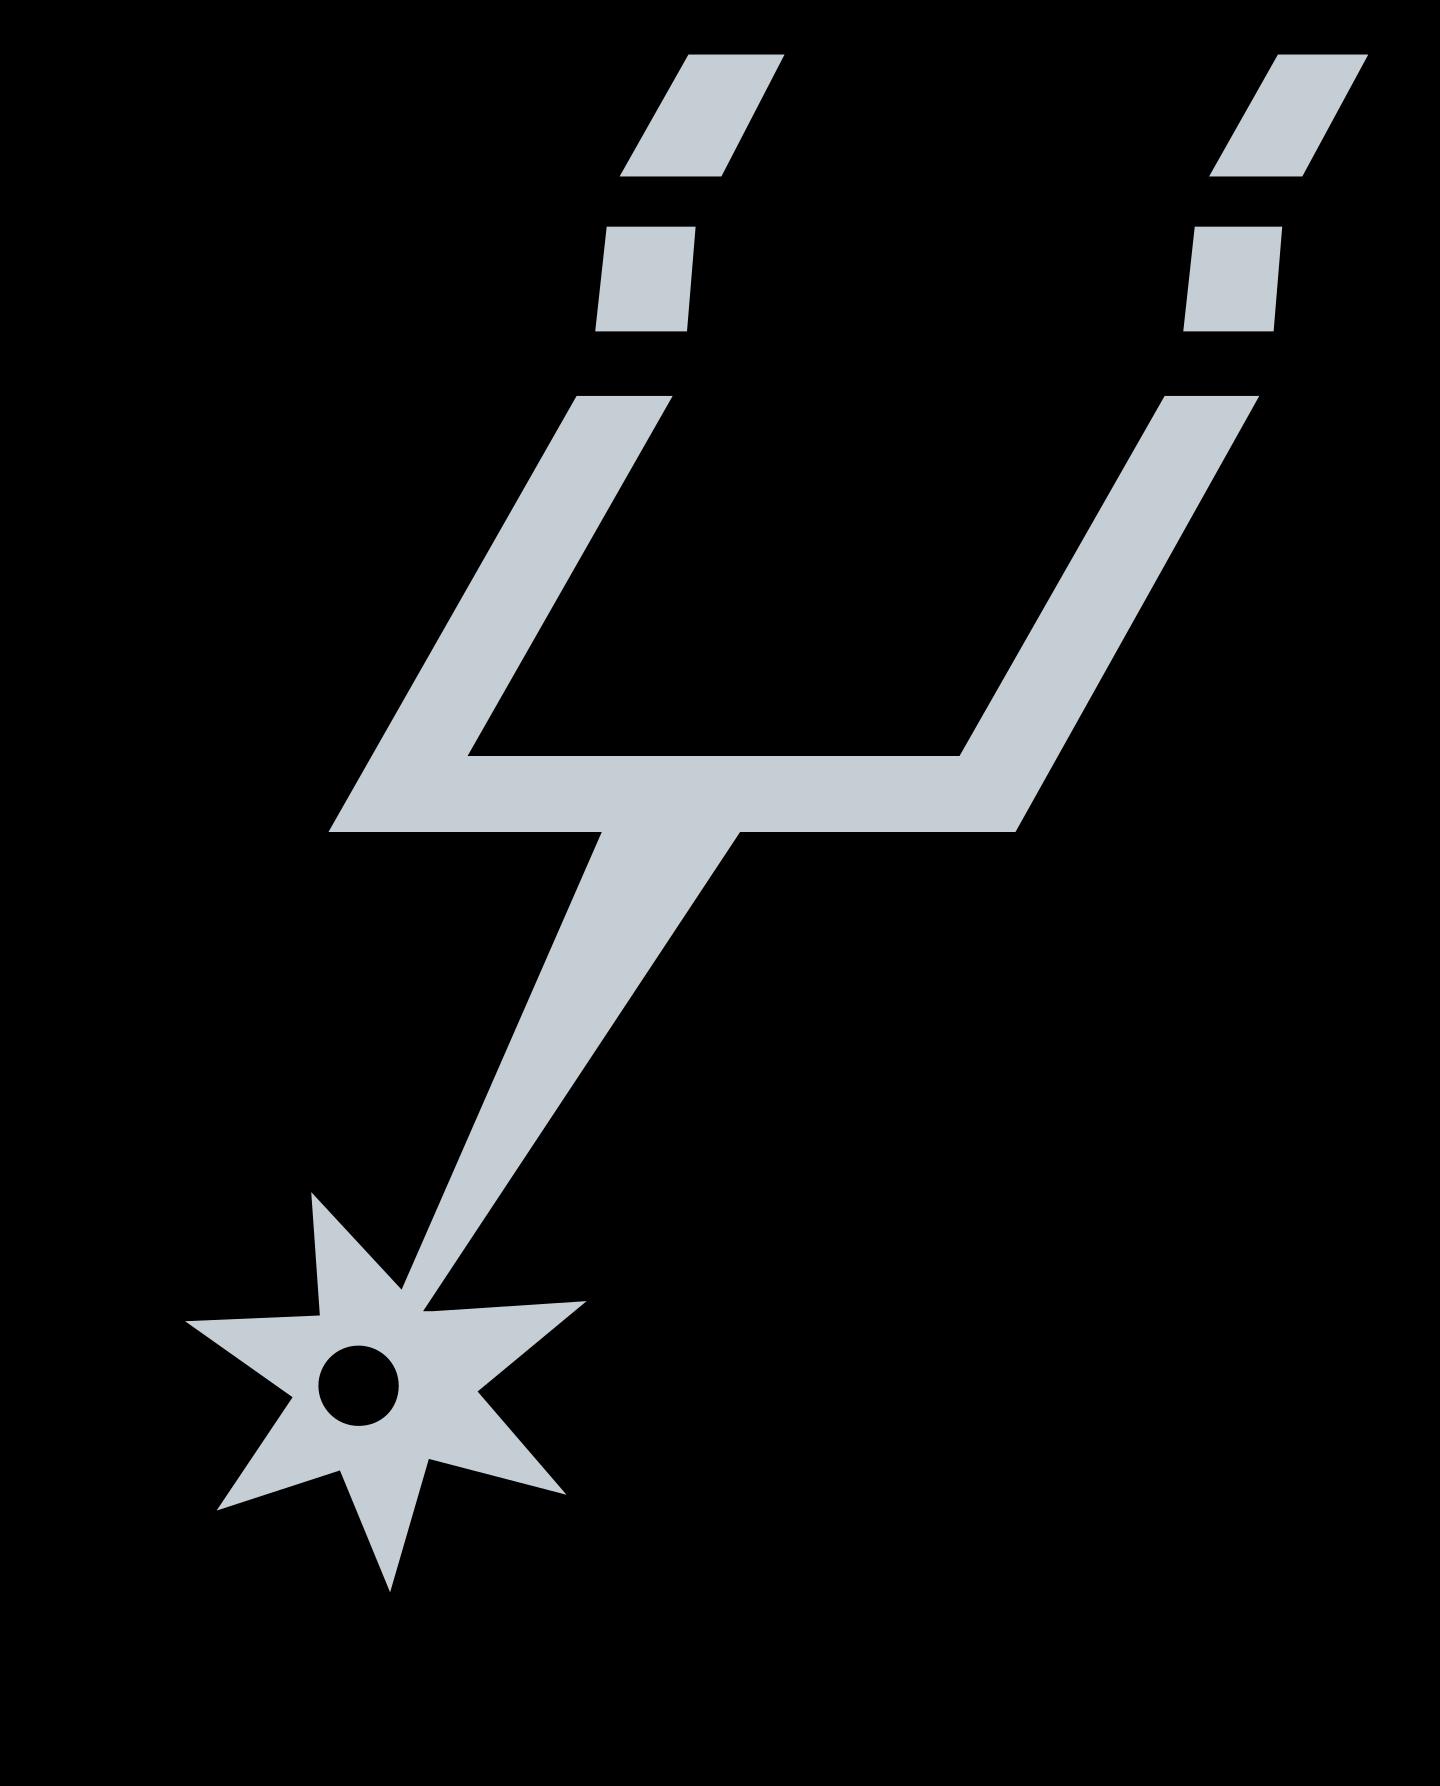 san antonio spurs logo 2 - San Antonio Spurs Logo